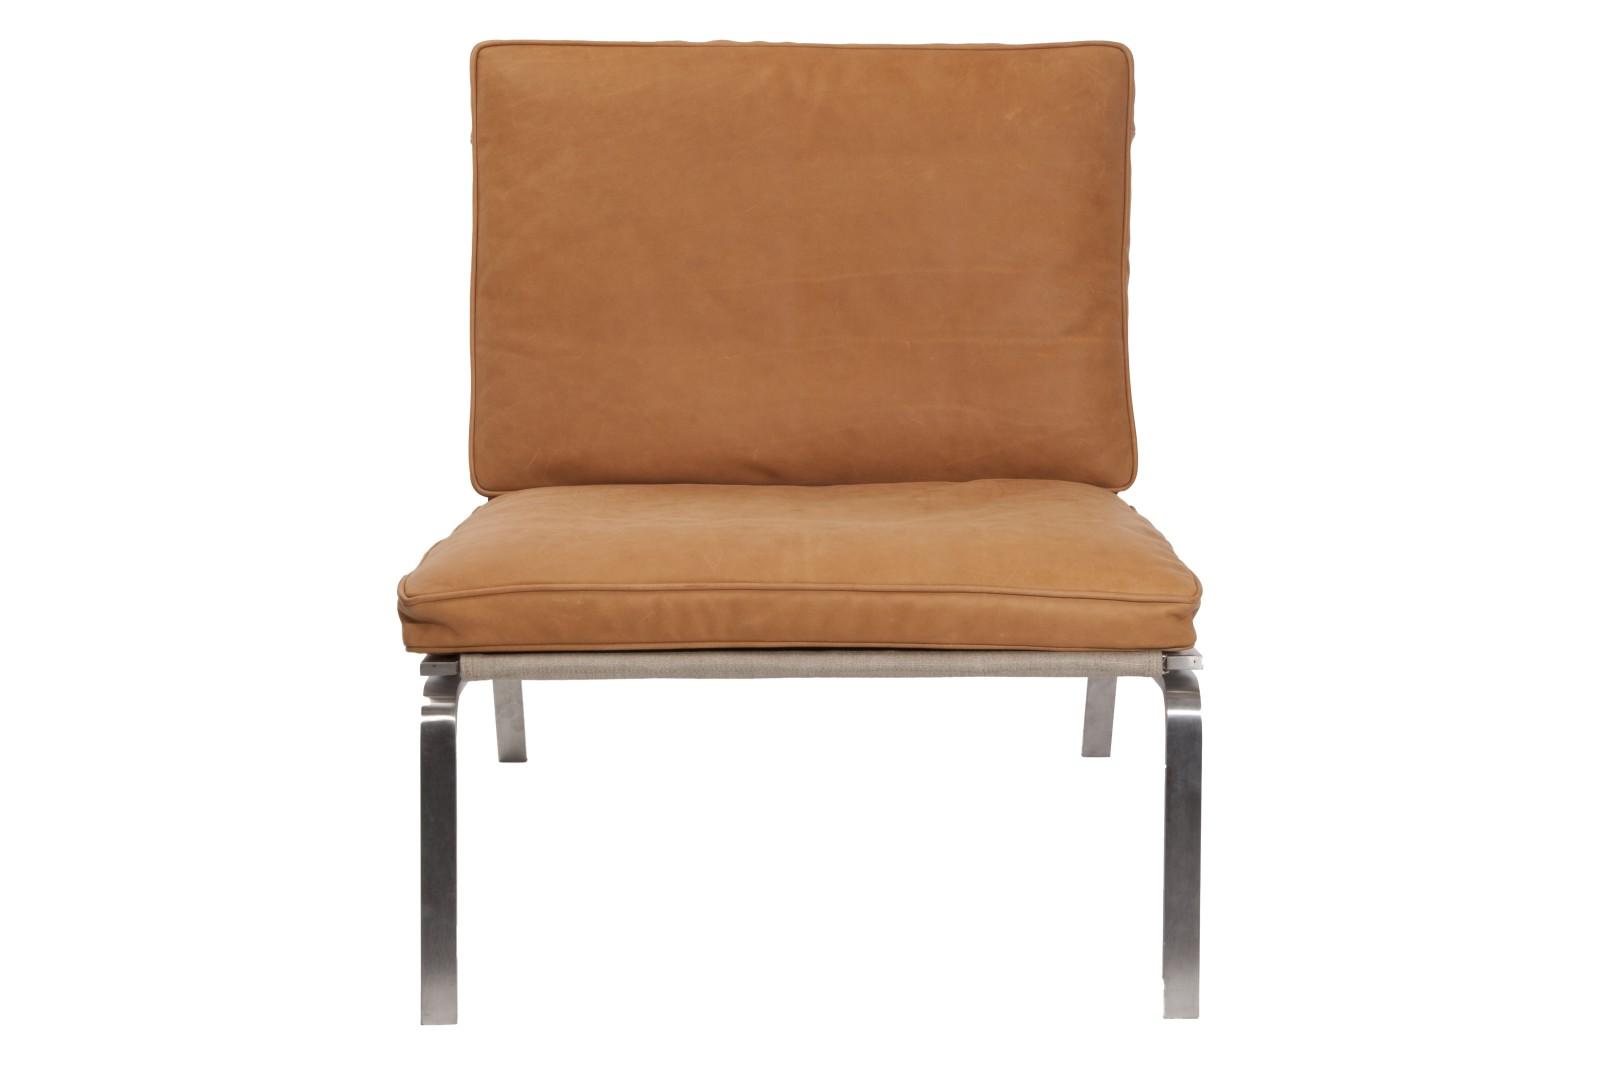 Man Lounge Chair Cognac Brown Premium Leather